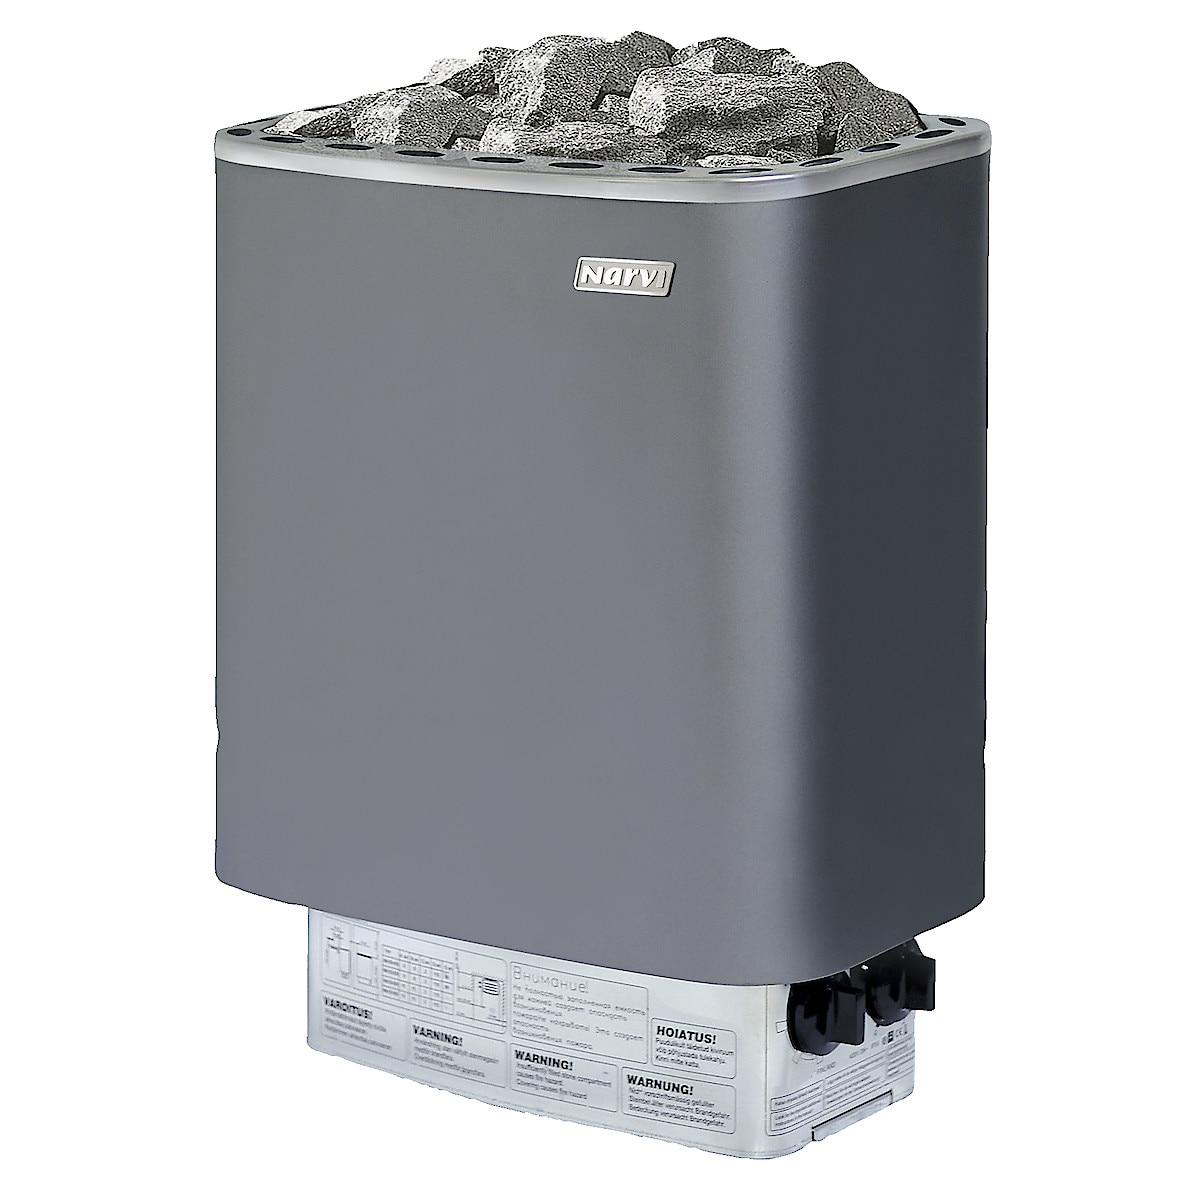 Narvi NM 600 230 V badstuaggregat